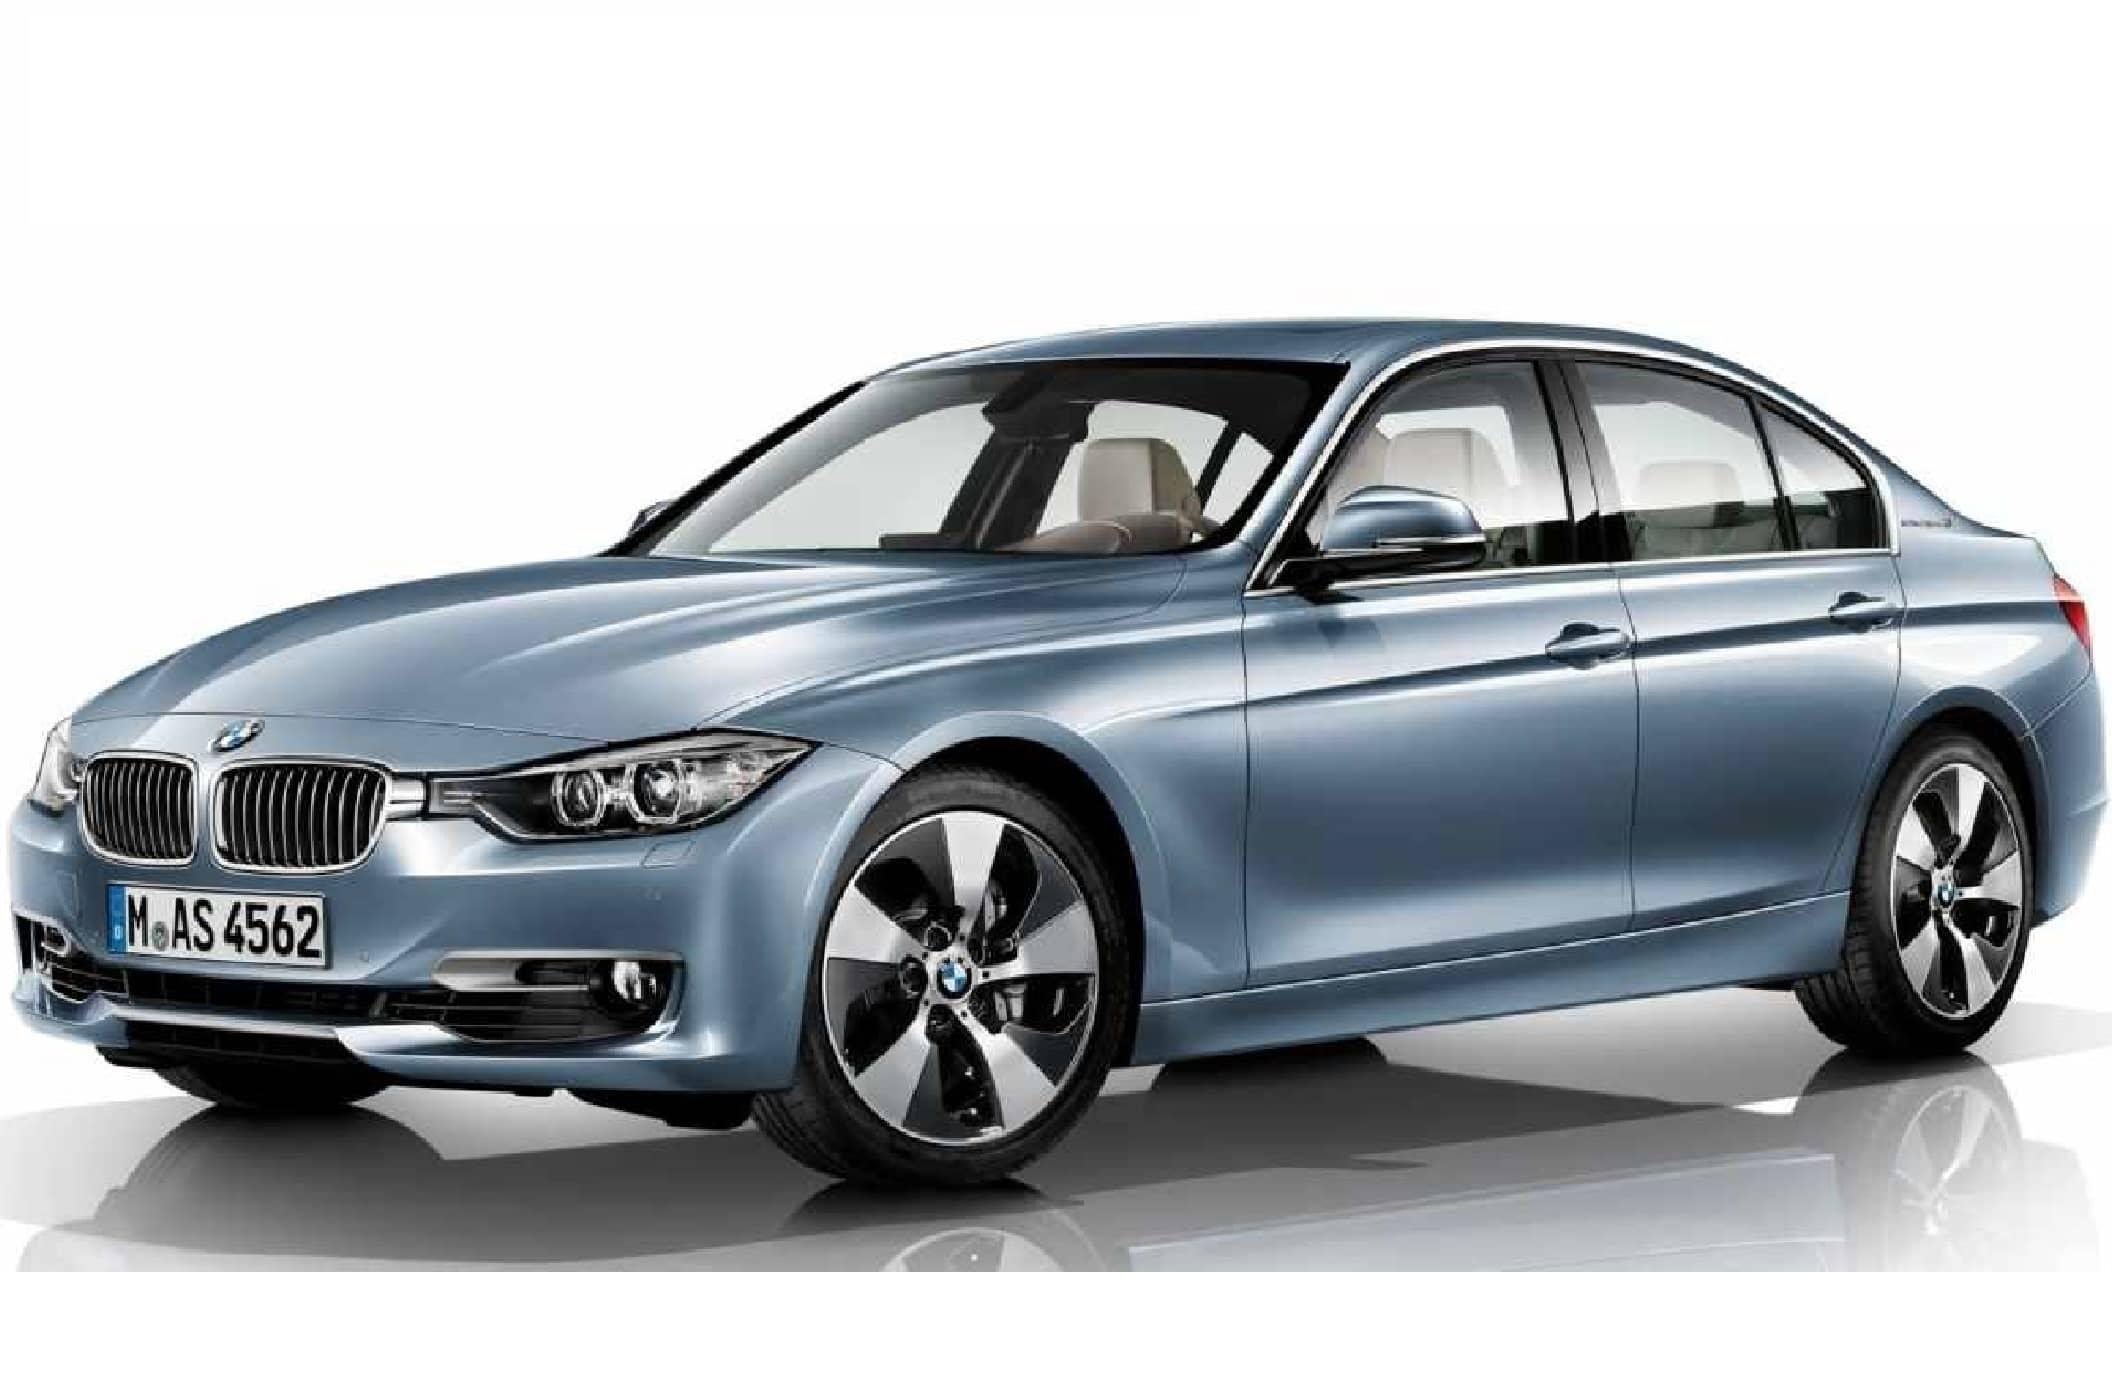 Сход-развал BMW серии 3